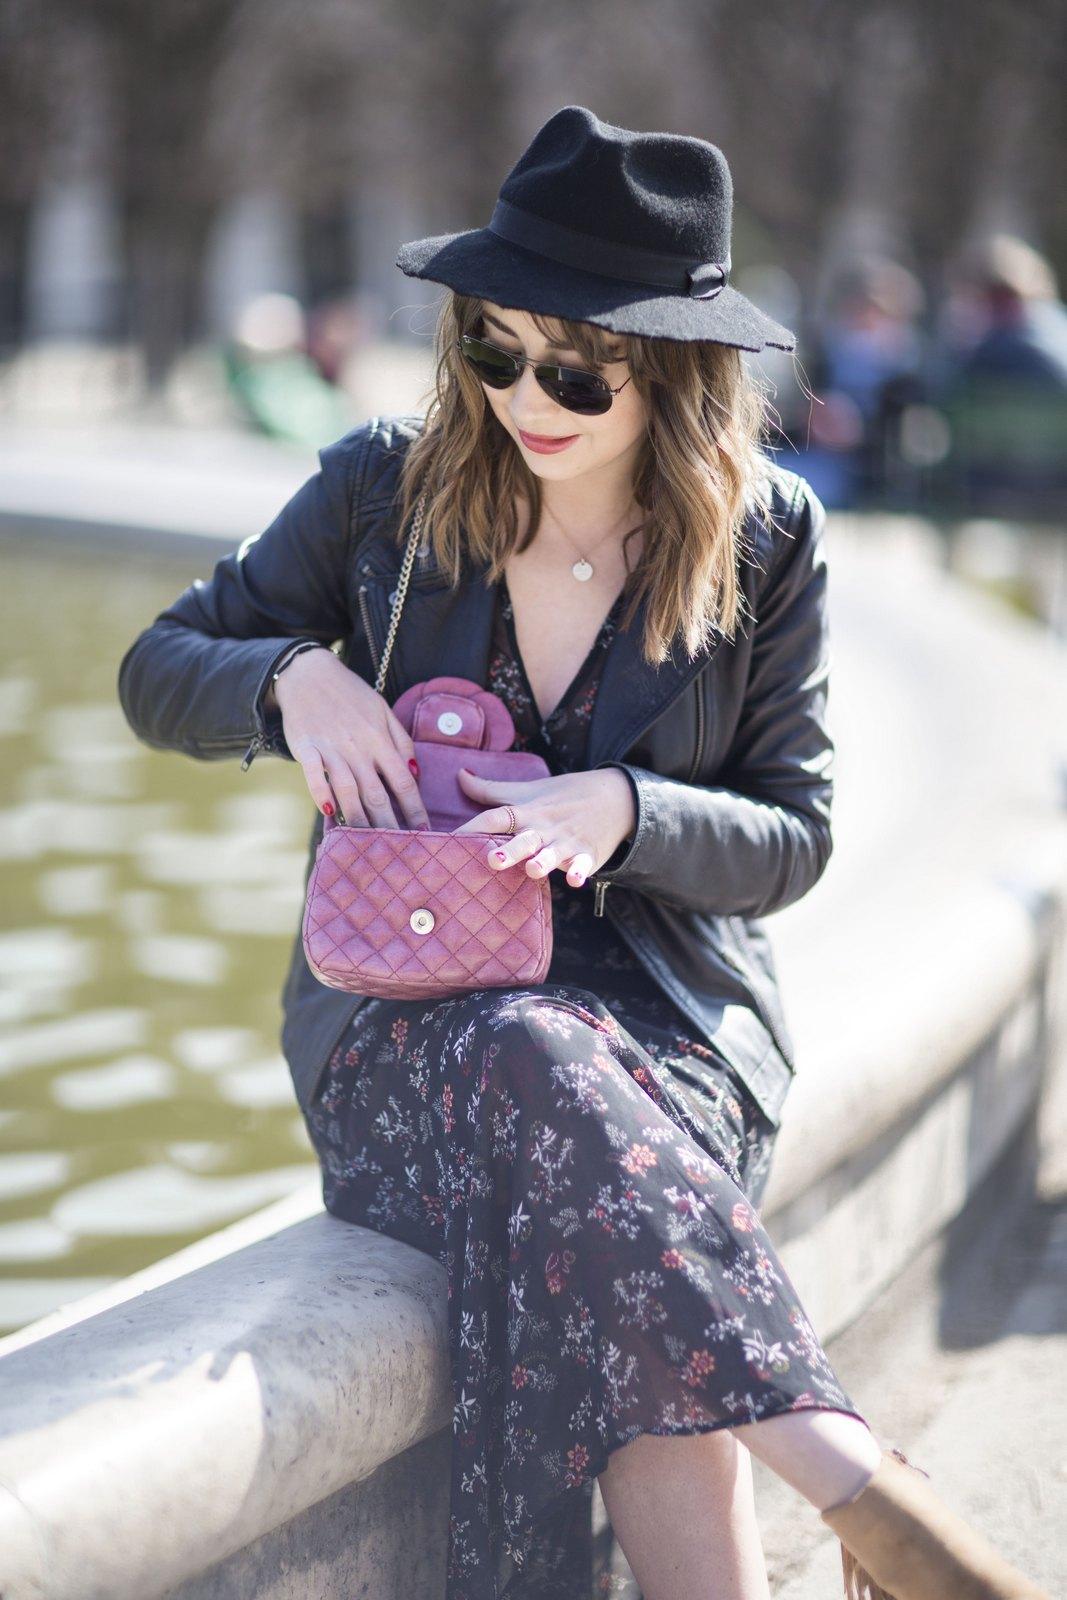 Blog mode femme Paris - Du style, Madame - Streetstyle - robe longue - boheme